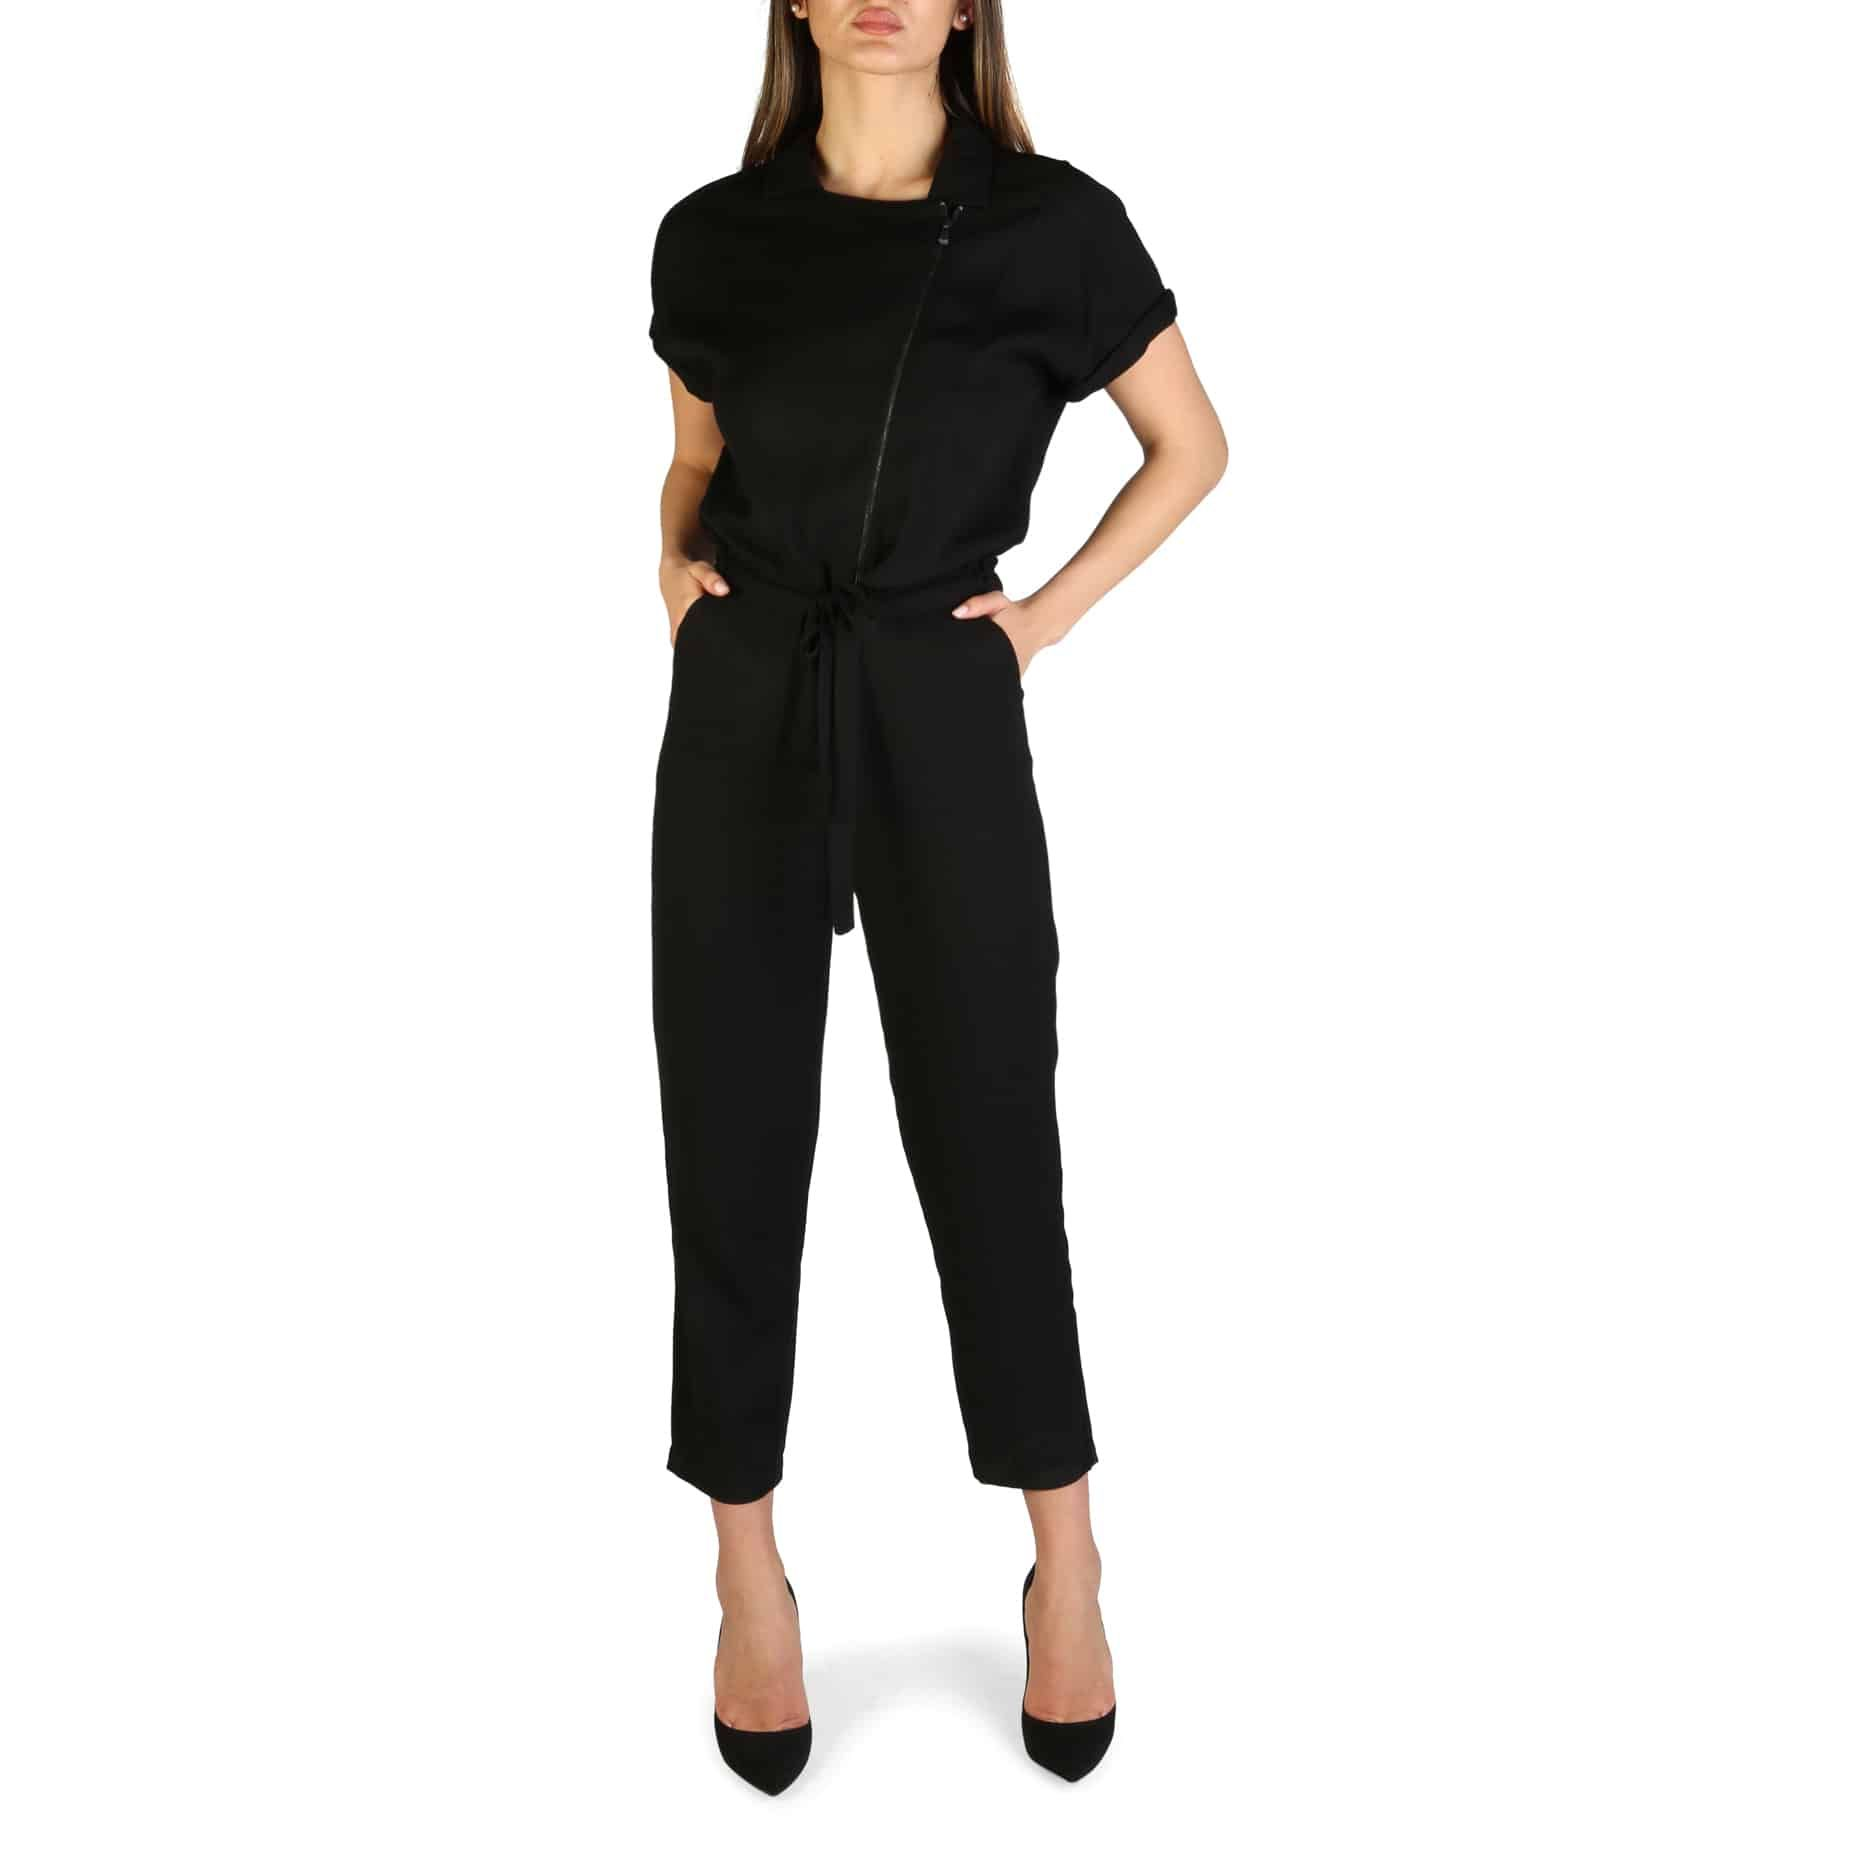 ARMANI EXCHANGE Tuta nera in tinta unita Abbigliamento